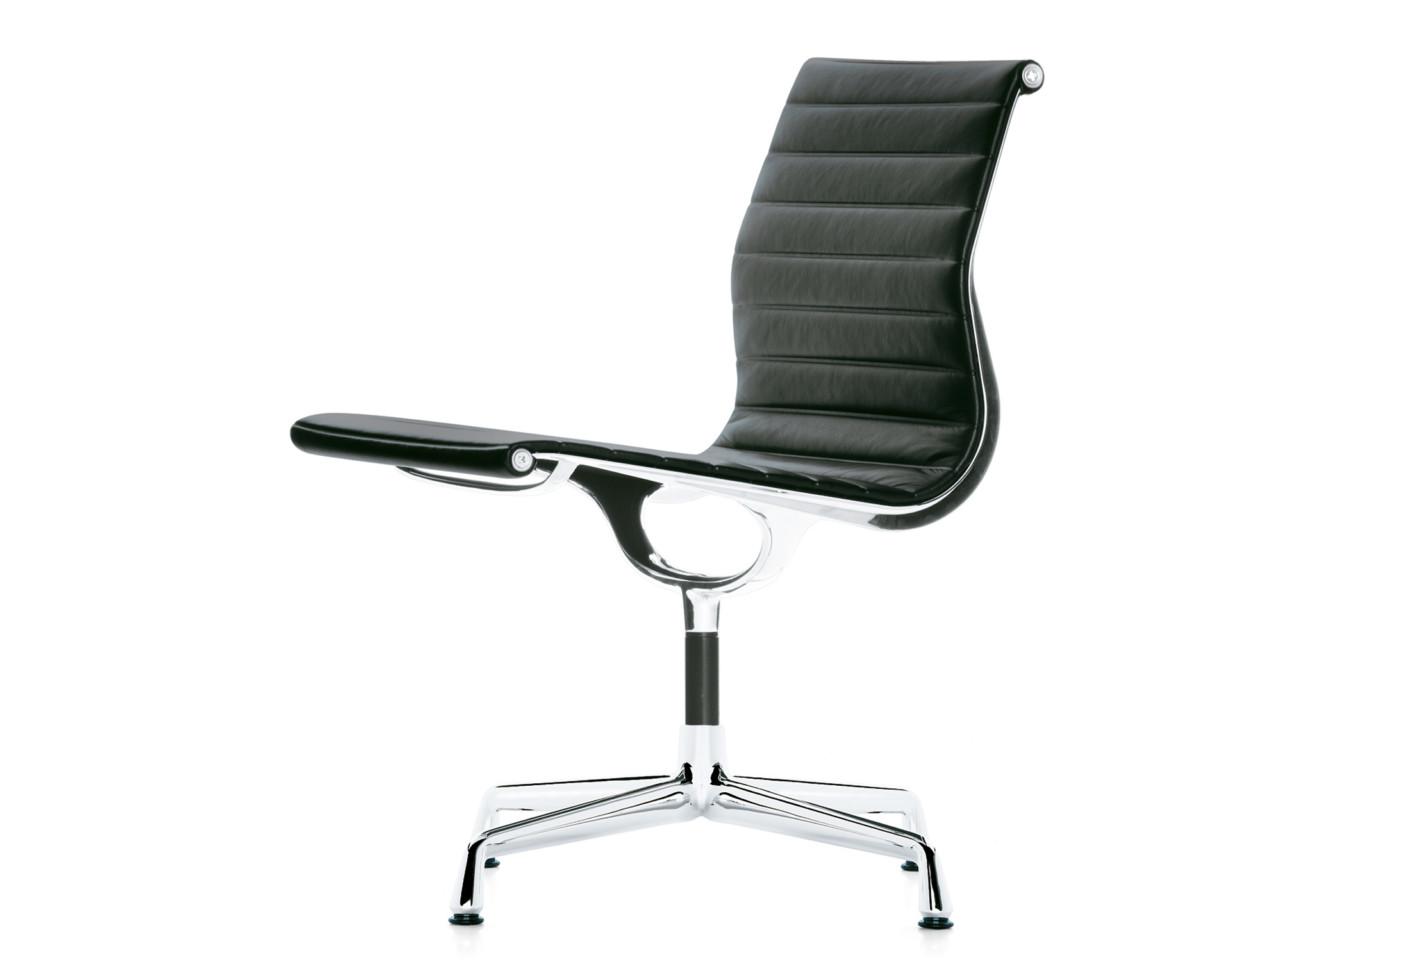 aluminium chair 105 106 von vitra stylepark. Black Bedroom Furniture Sets. Home Design Ideas